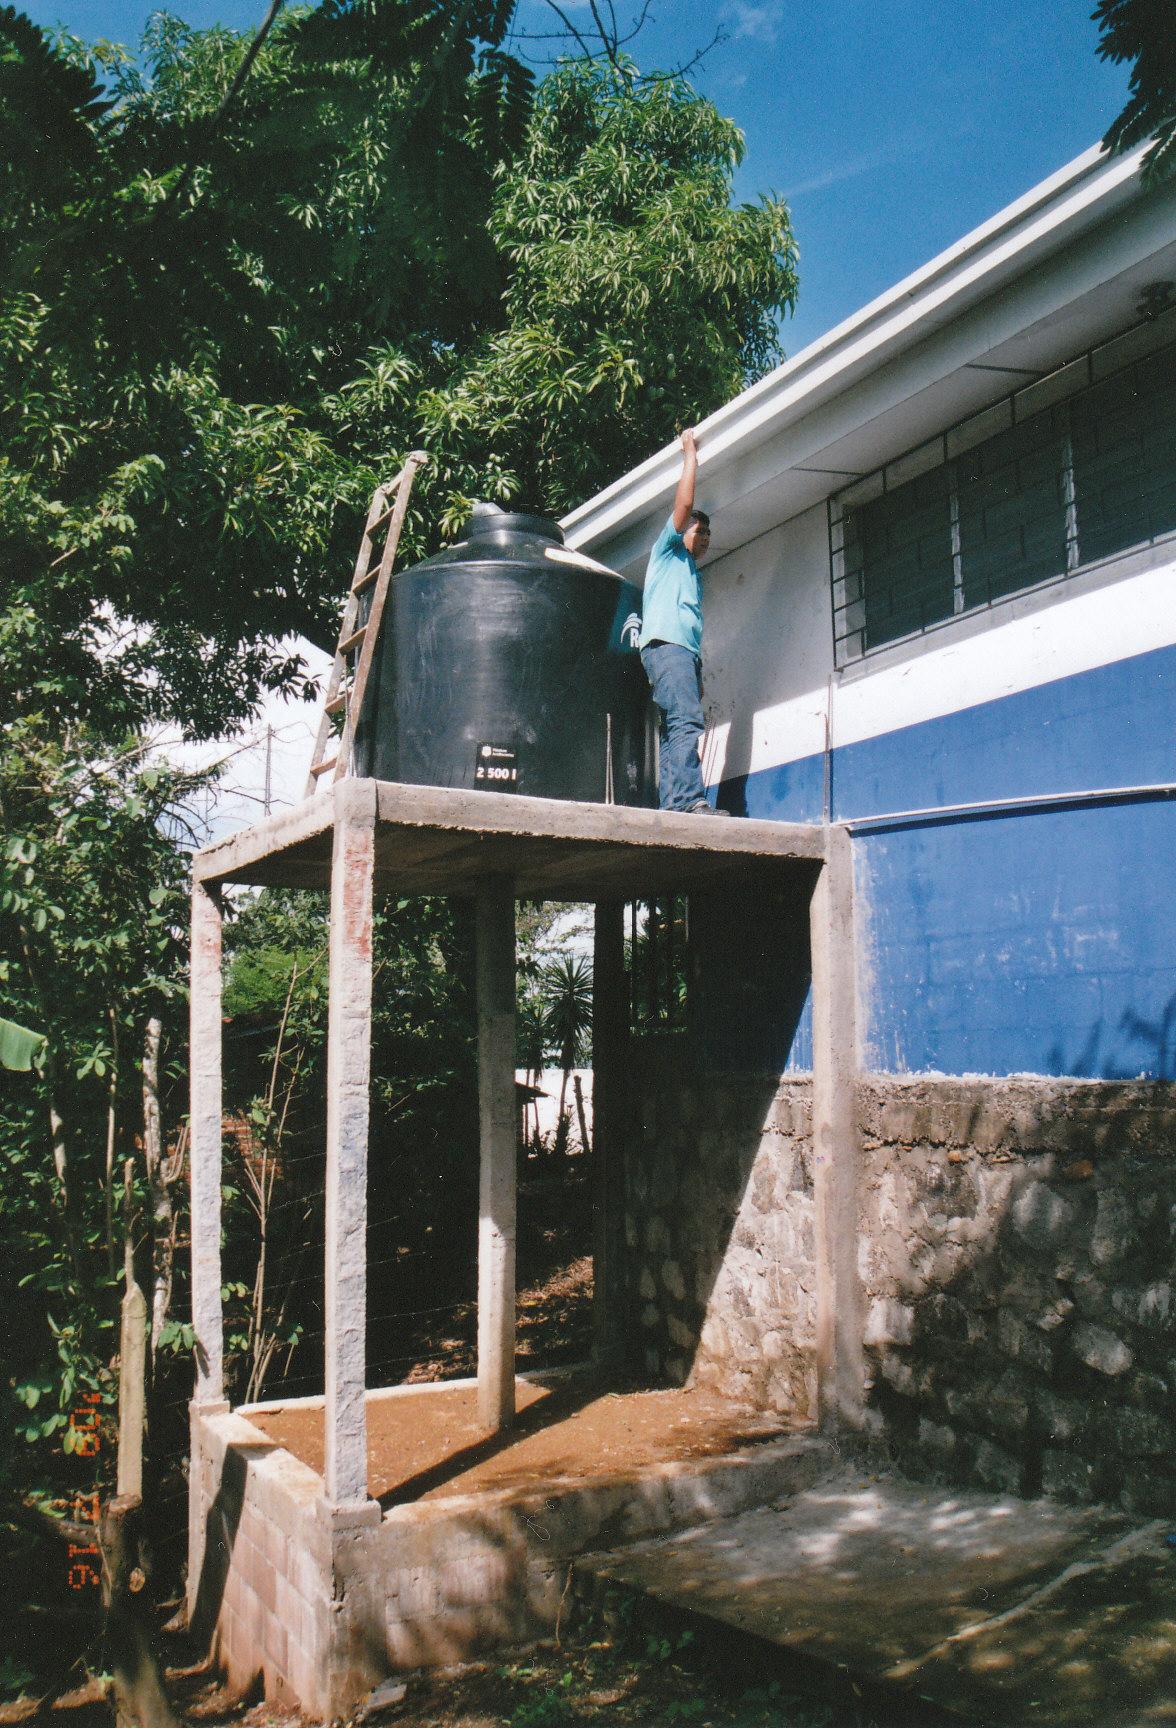 Rainwater Catchment System El Salvador